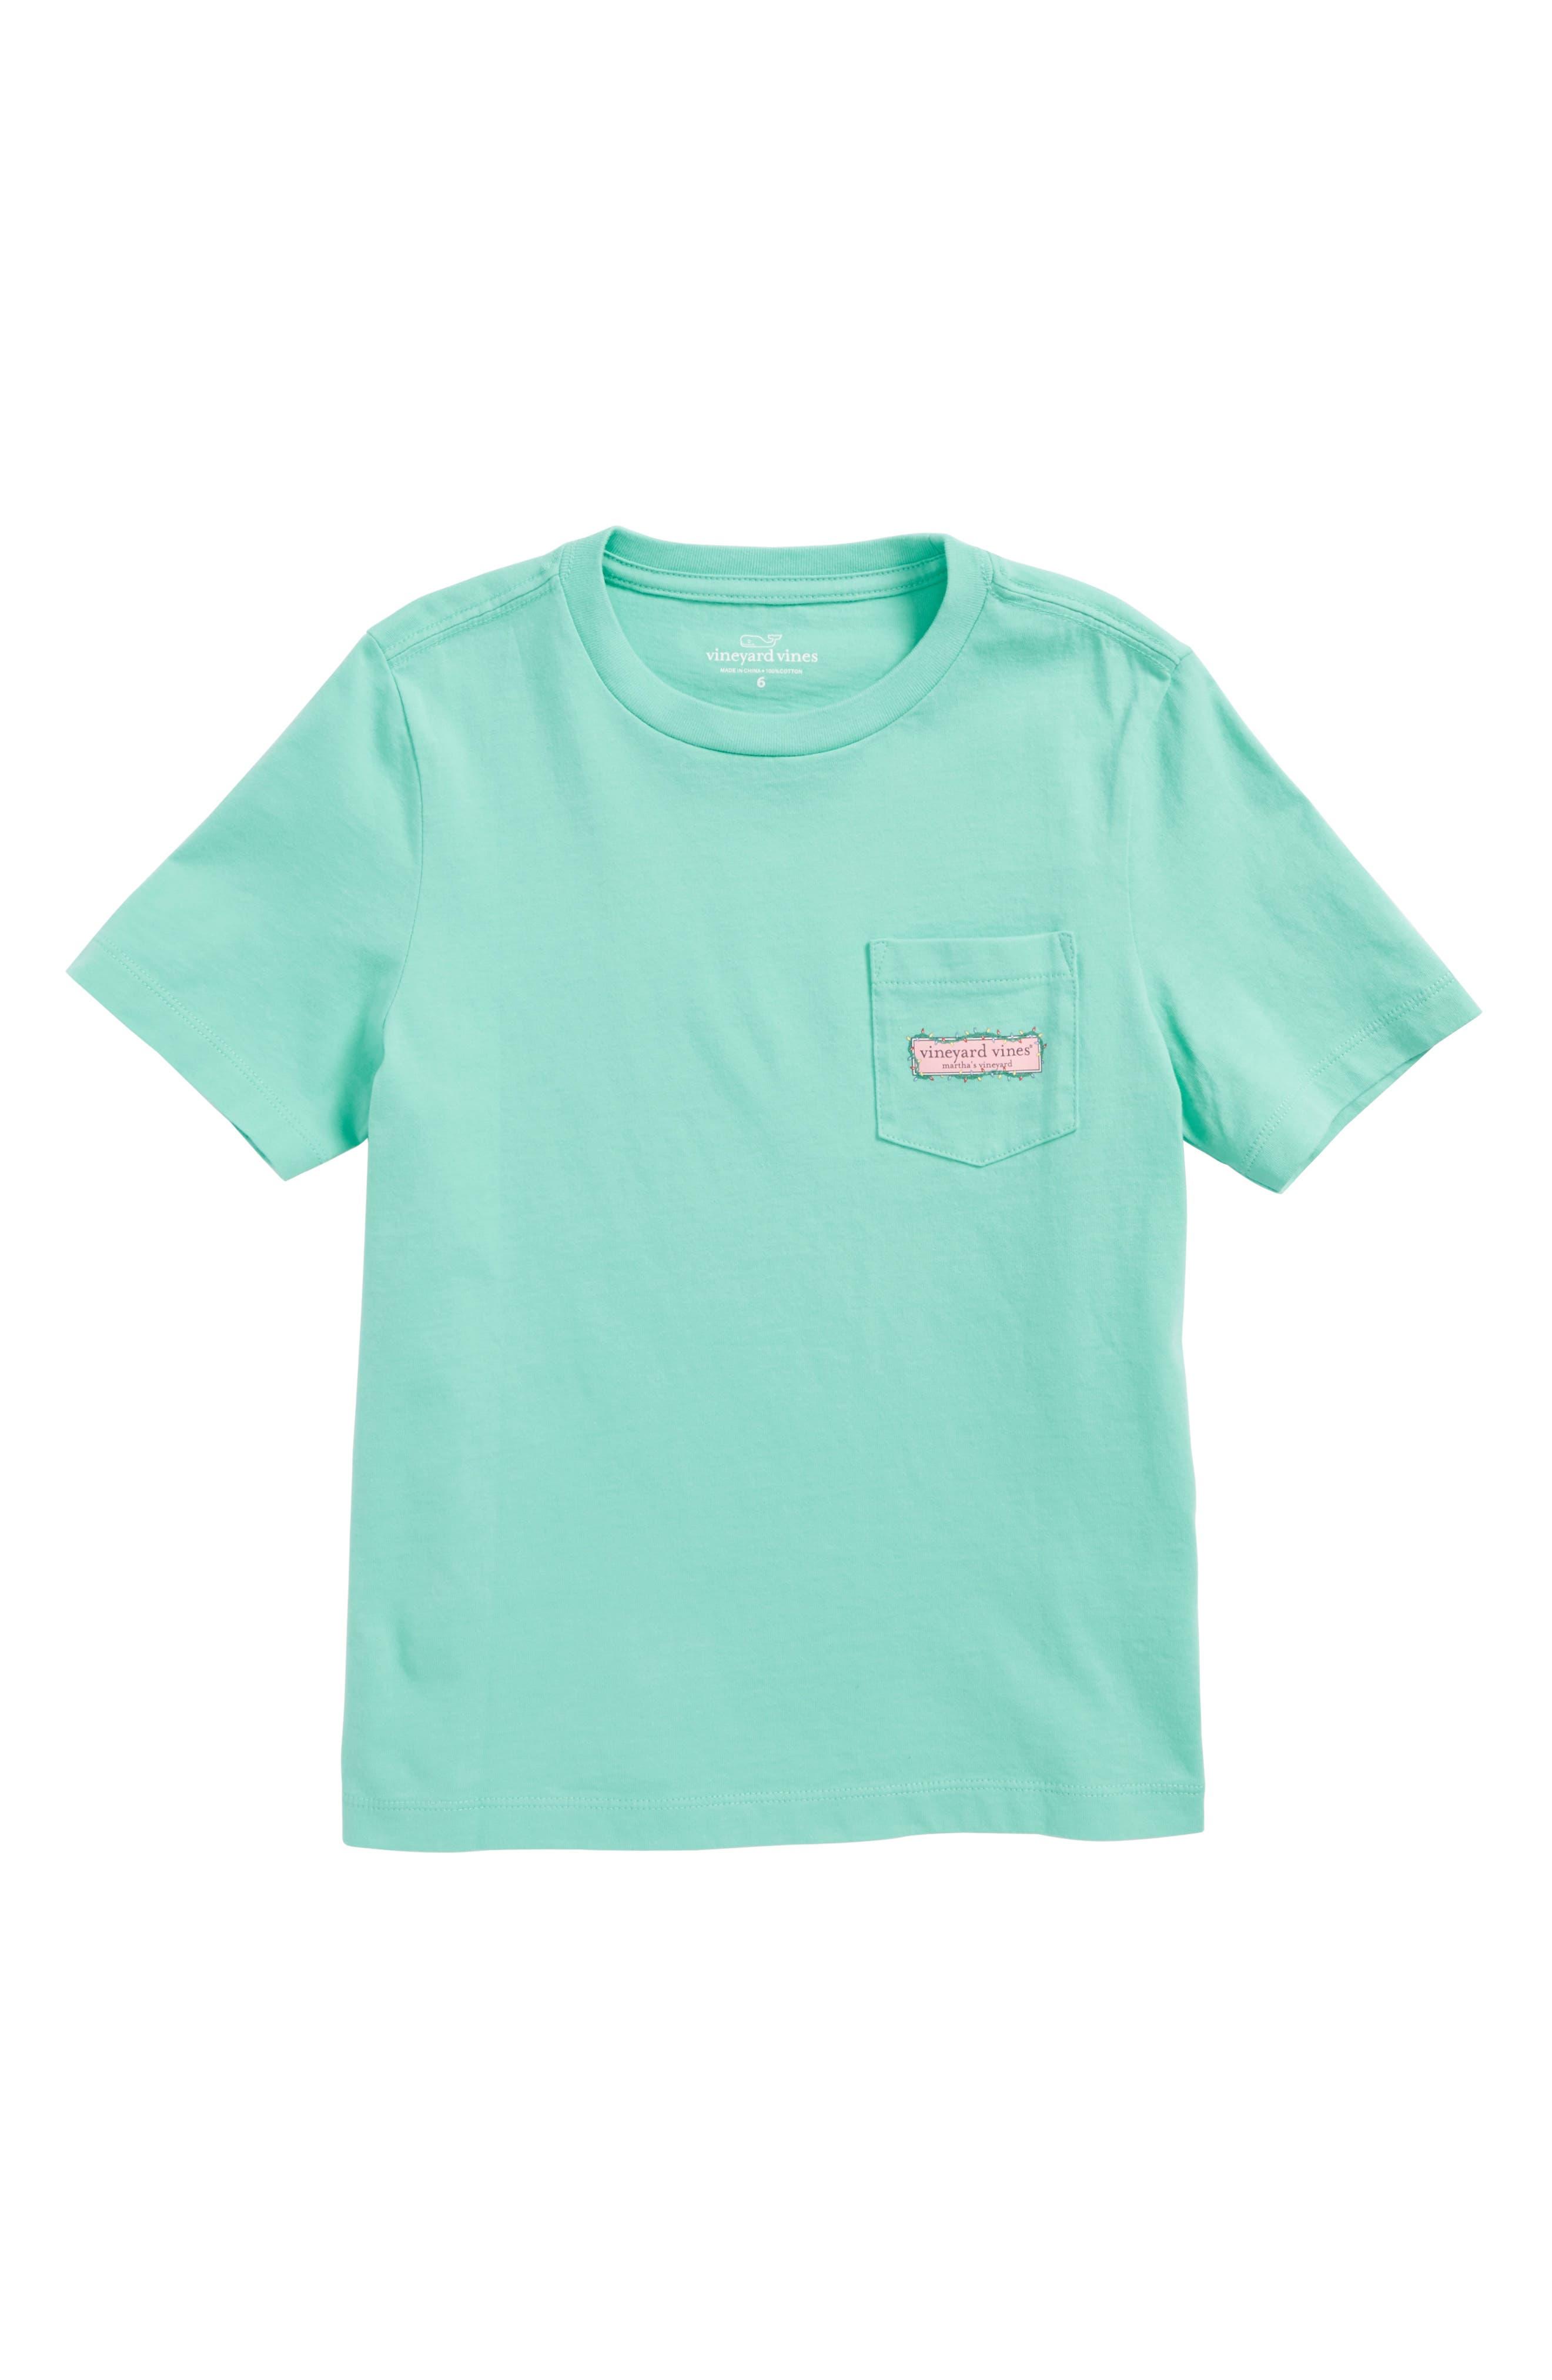 vineyard vines Box Lights Logo T-Shirt (Toddler Boys & Little Boys)